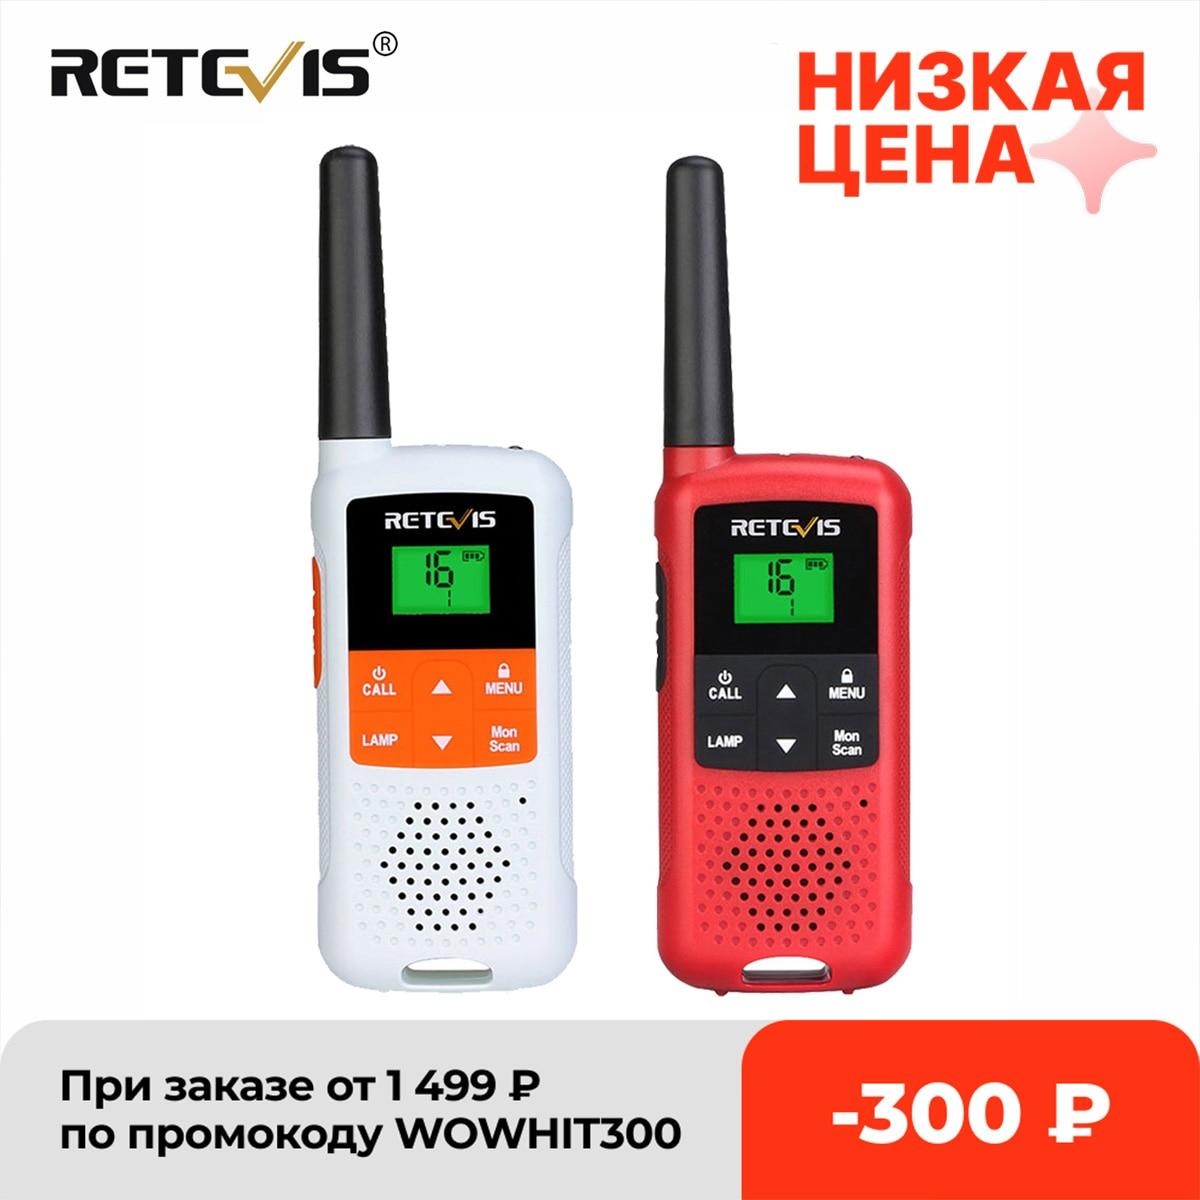 Retevis RT649B Walkie Talkie 2 or 4 pcs PMR446 Walkie-talkies 1.8km for Motorola Two-way radio Hunting Fishing Rechargeable VOX